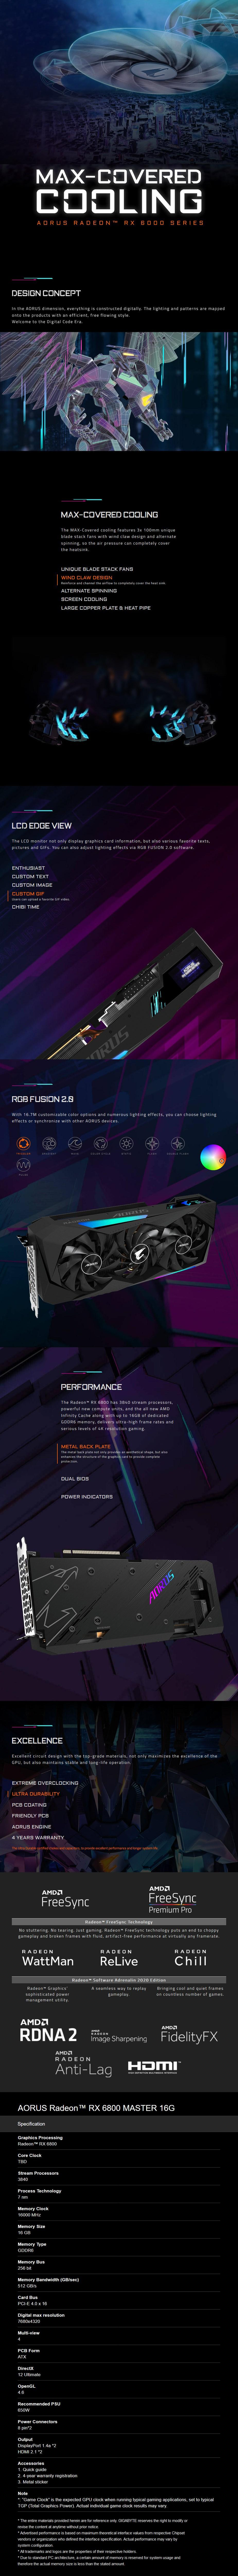 Gigabyte Radeon RX 6800 AORUS MASTER 16GB Video Card - Overview 1